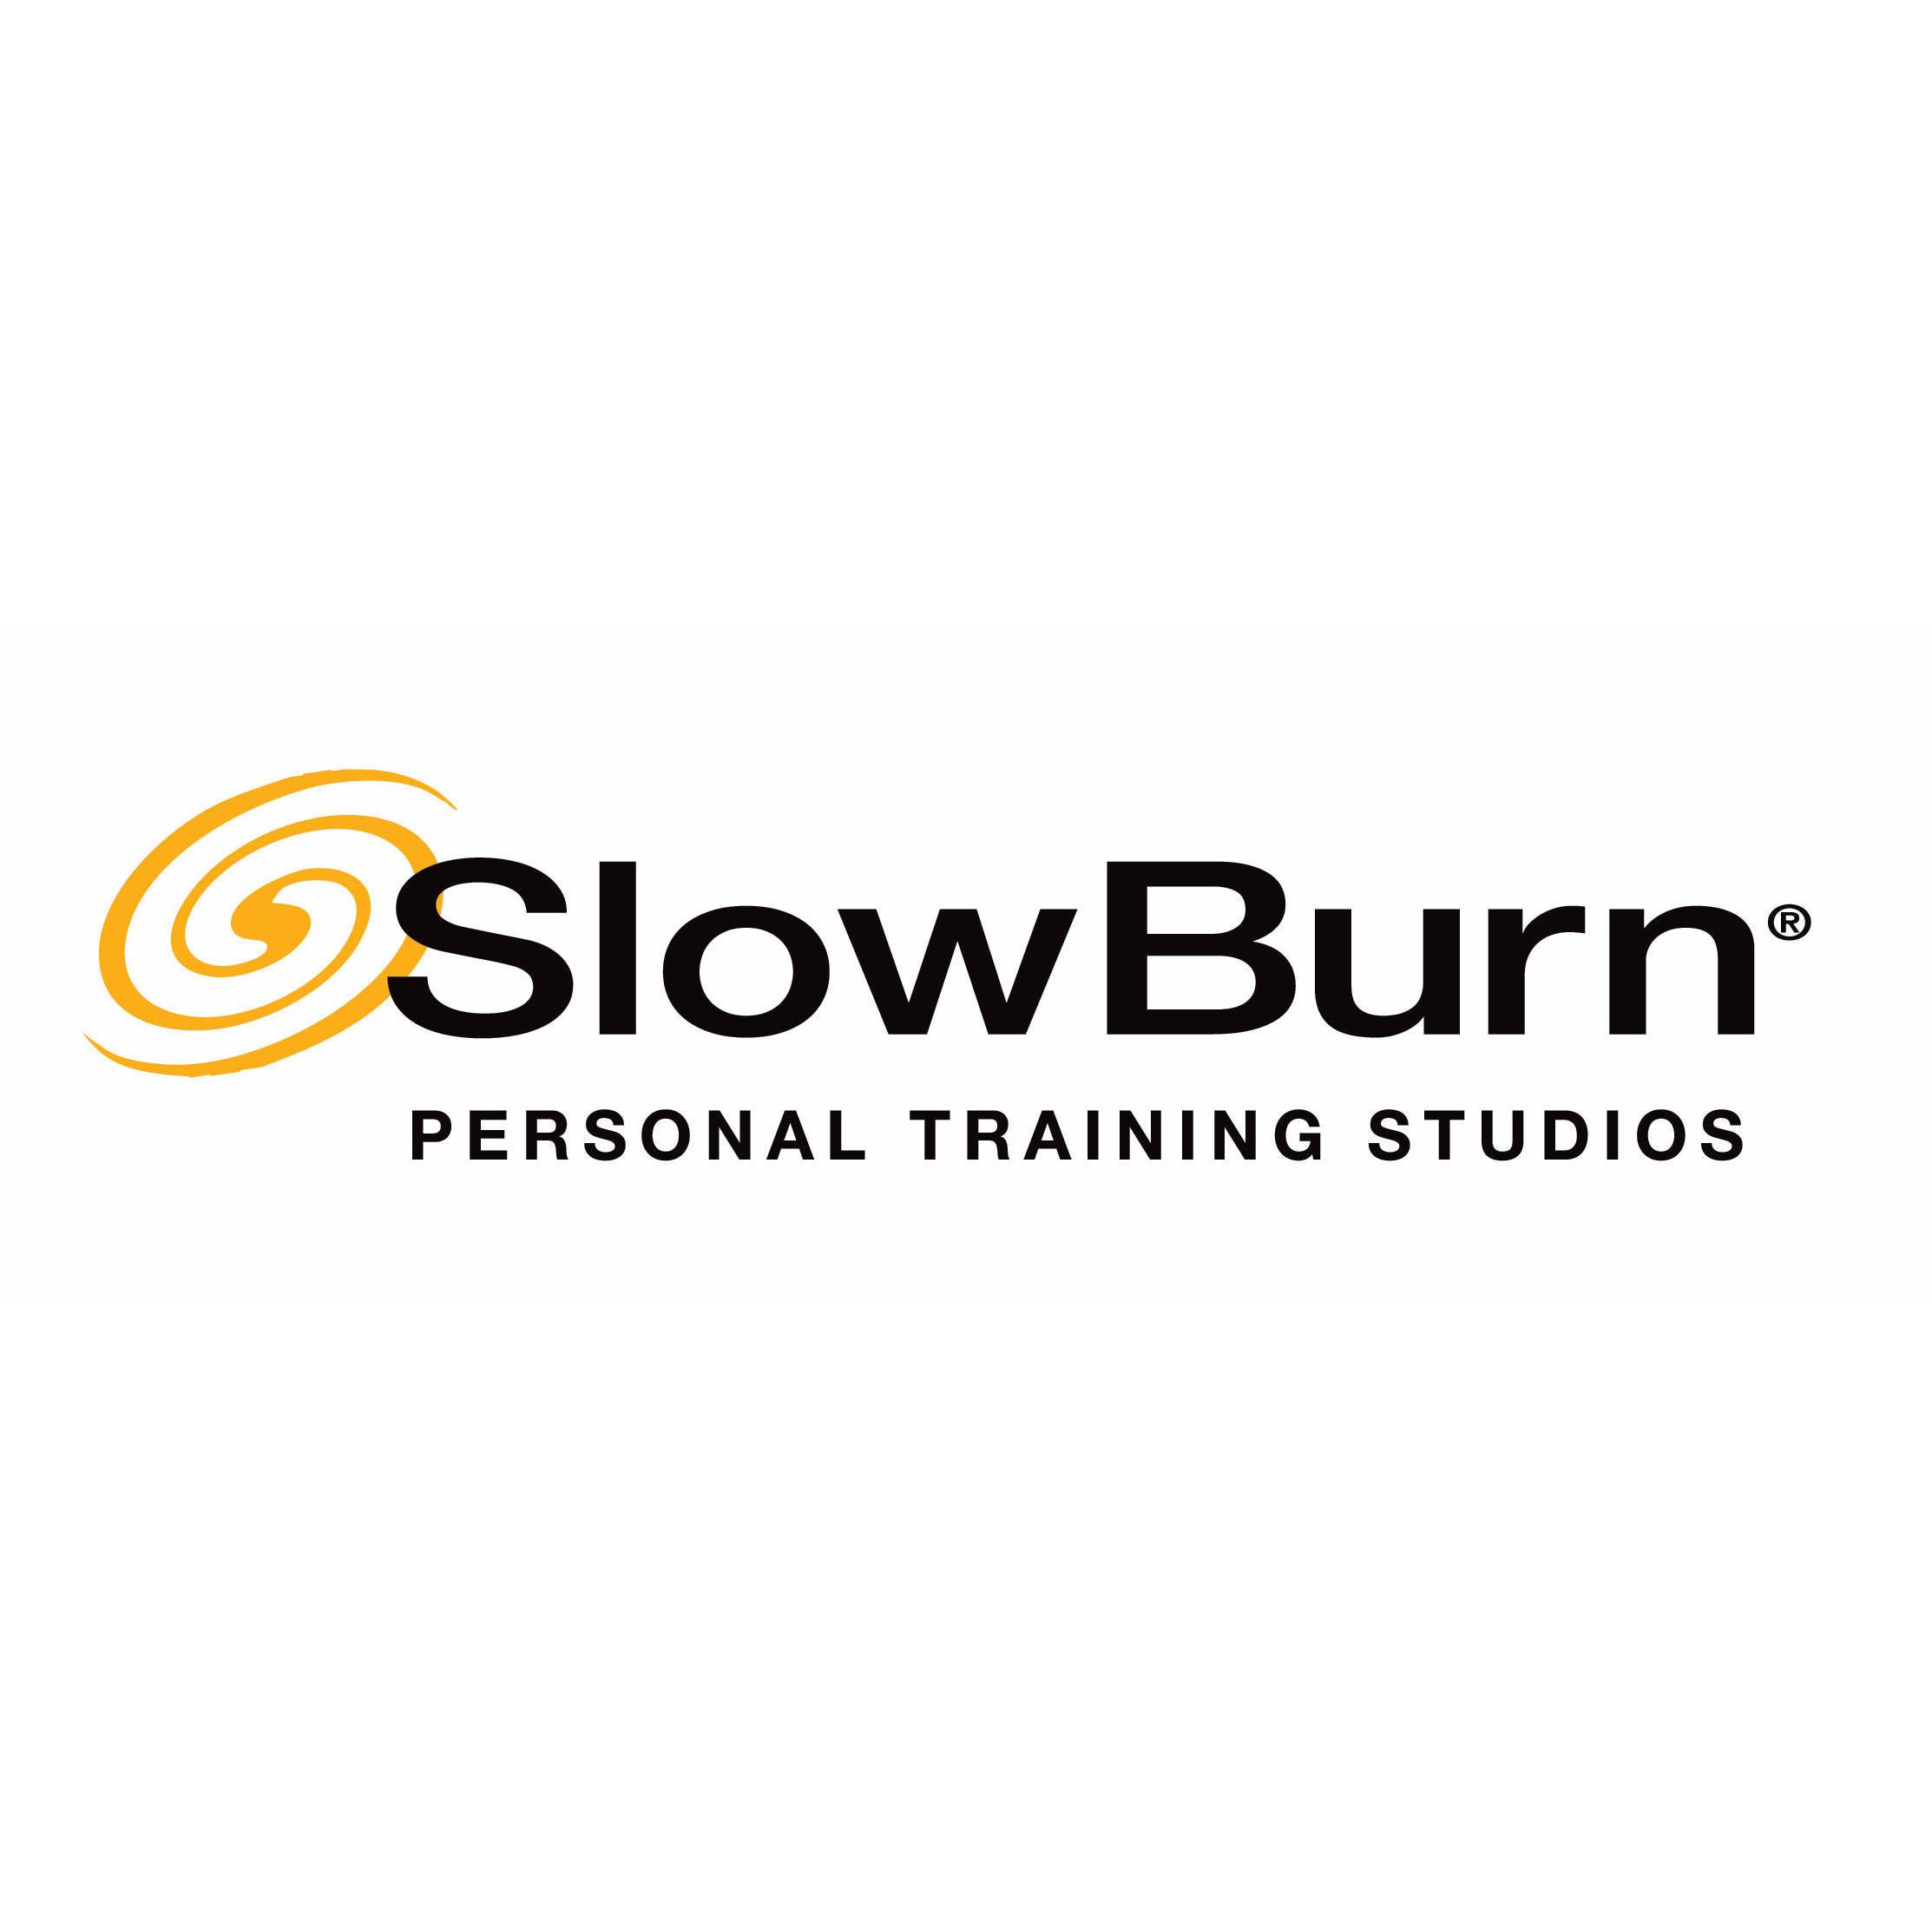 SlowBurn Personal Training Studios